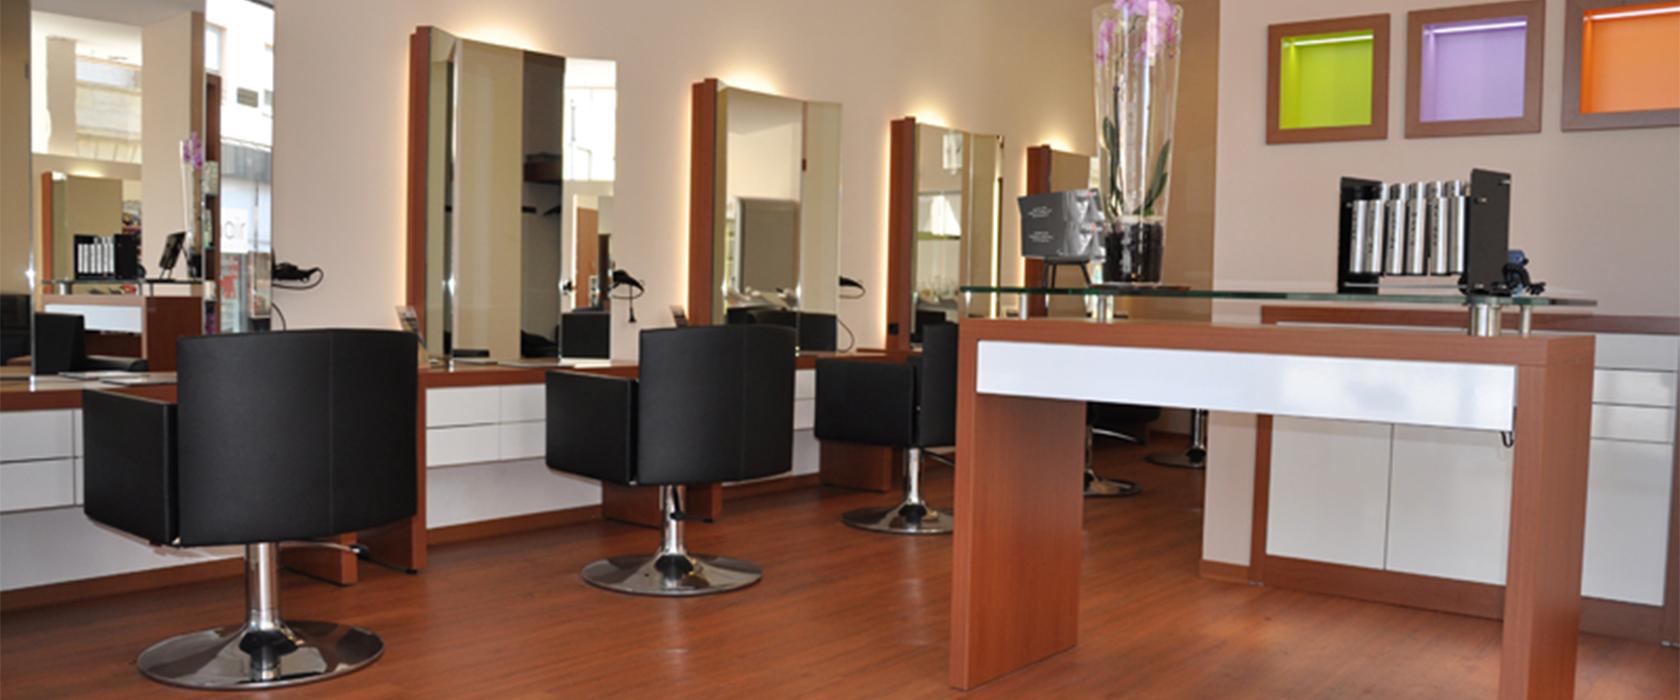 Friseursalon Karlsruhe - Mod\'s Hair - Ihr Friseur in Karlsruhe